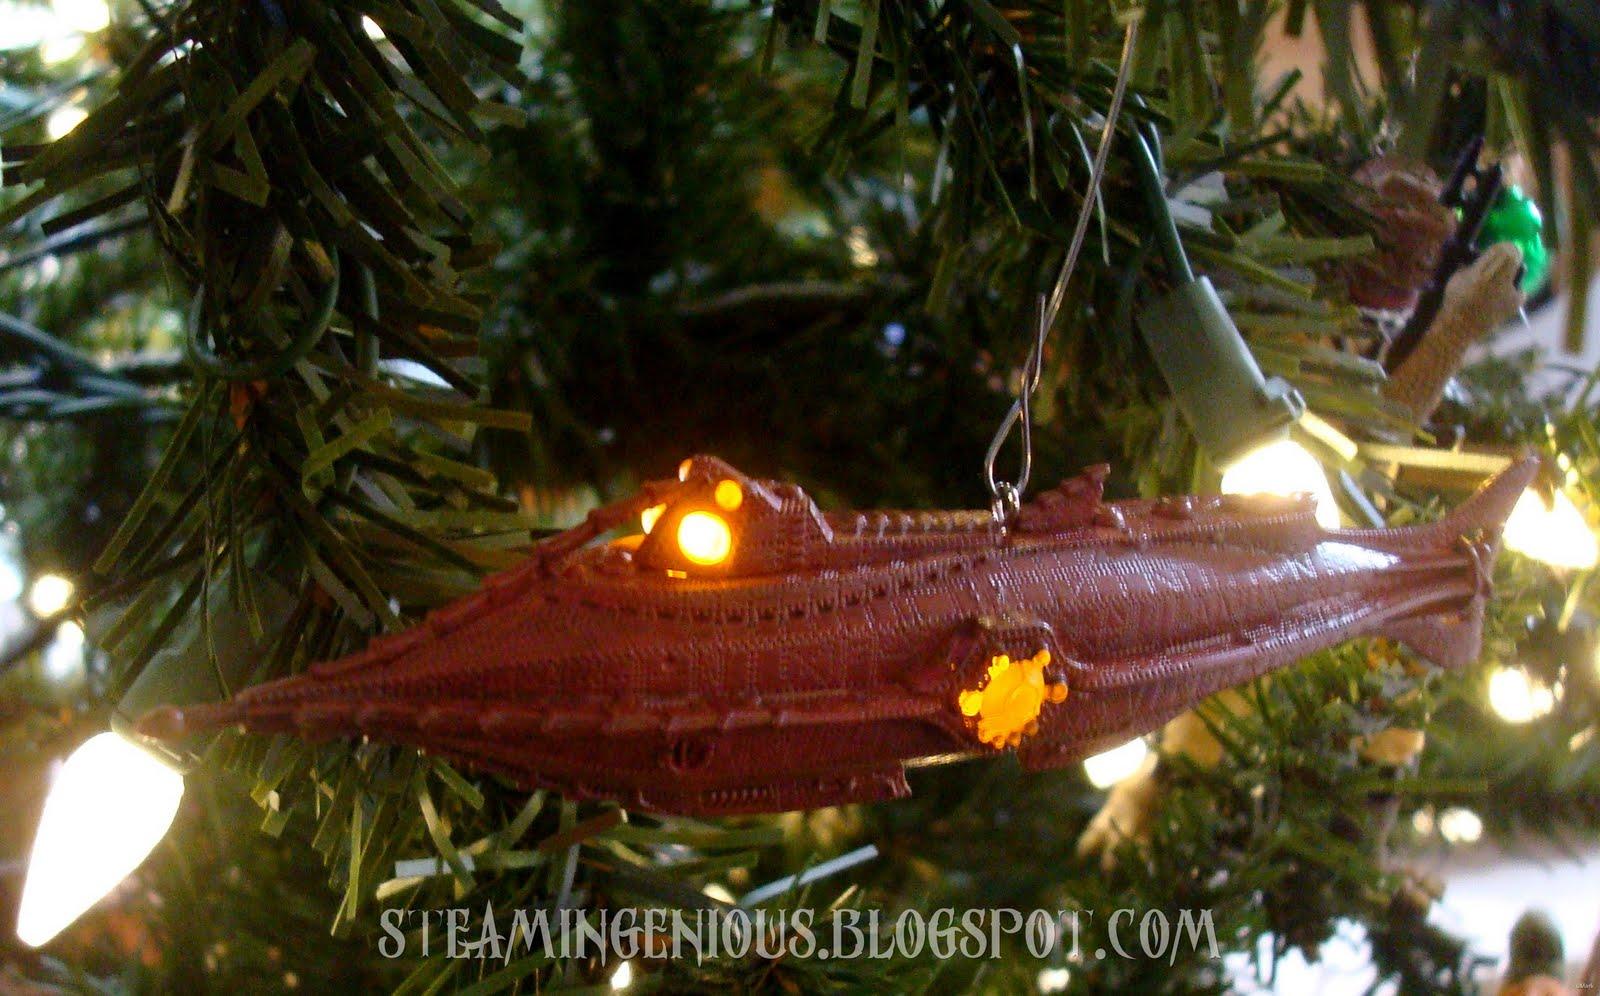 Steam Ingenious: Steampunk Christmas Ornaments